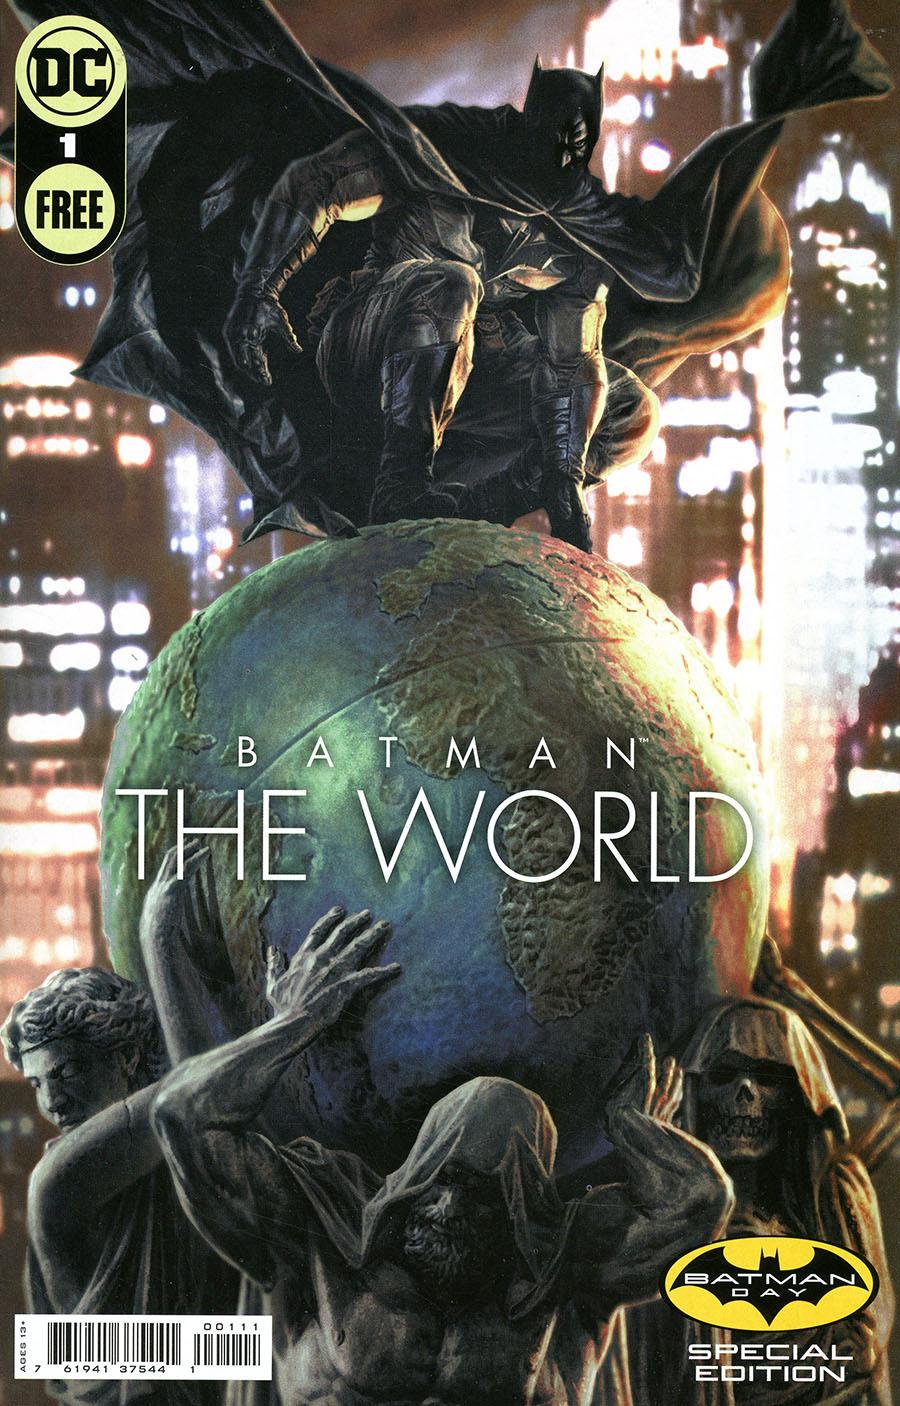 Batman The World Batman Day Special Edition #1 - FREE - Limit 1 Per Customer